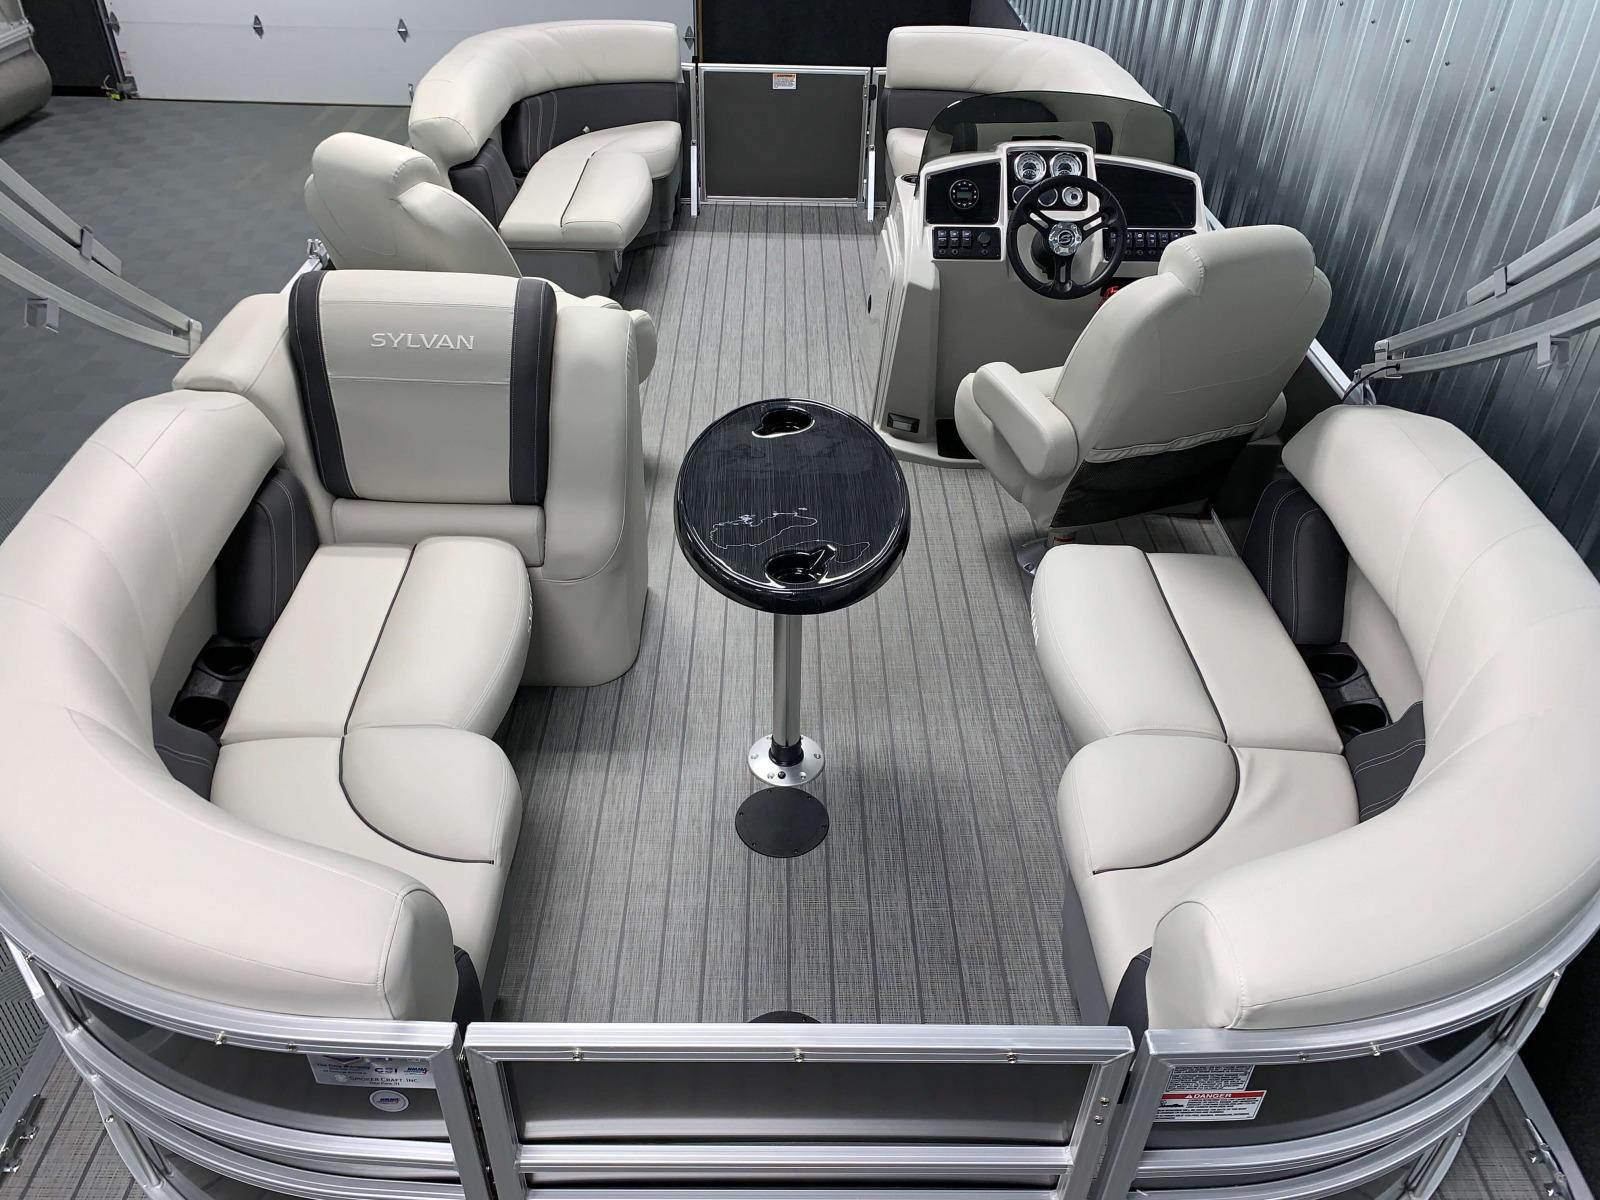 Teak Weave Vinyl Flooring of a 2021 Sylvan Mirage 8520 LZ Tritoon Boat